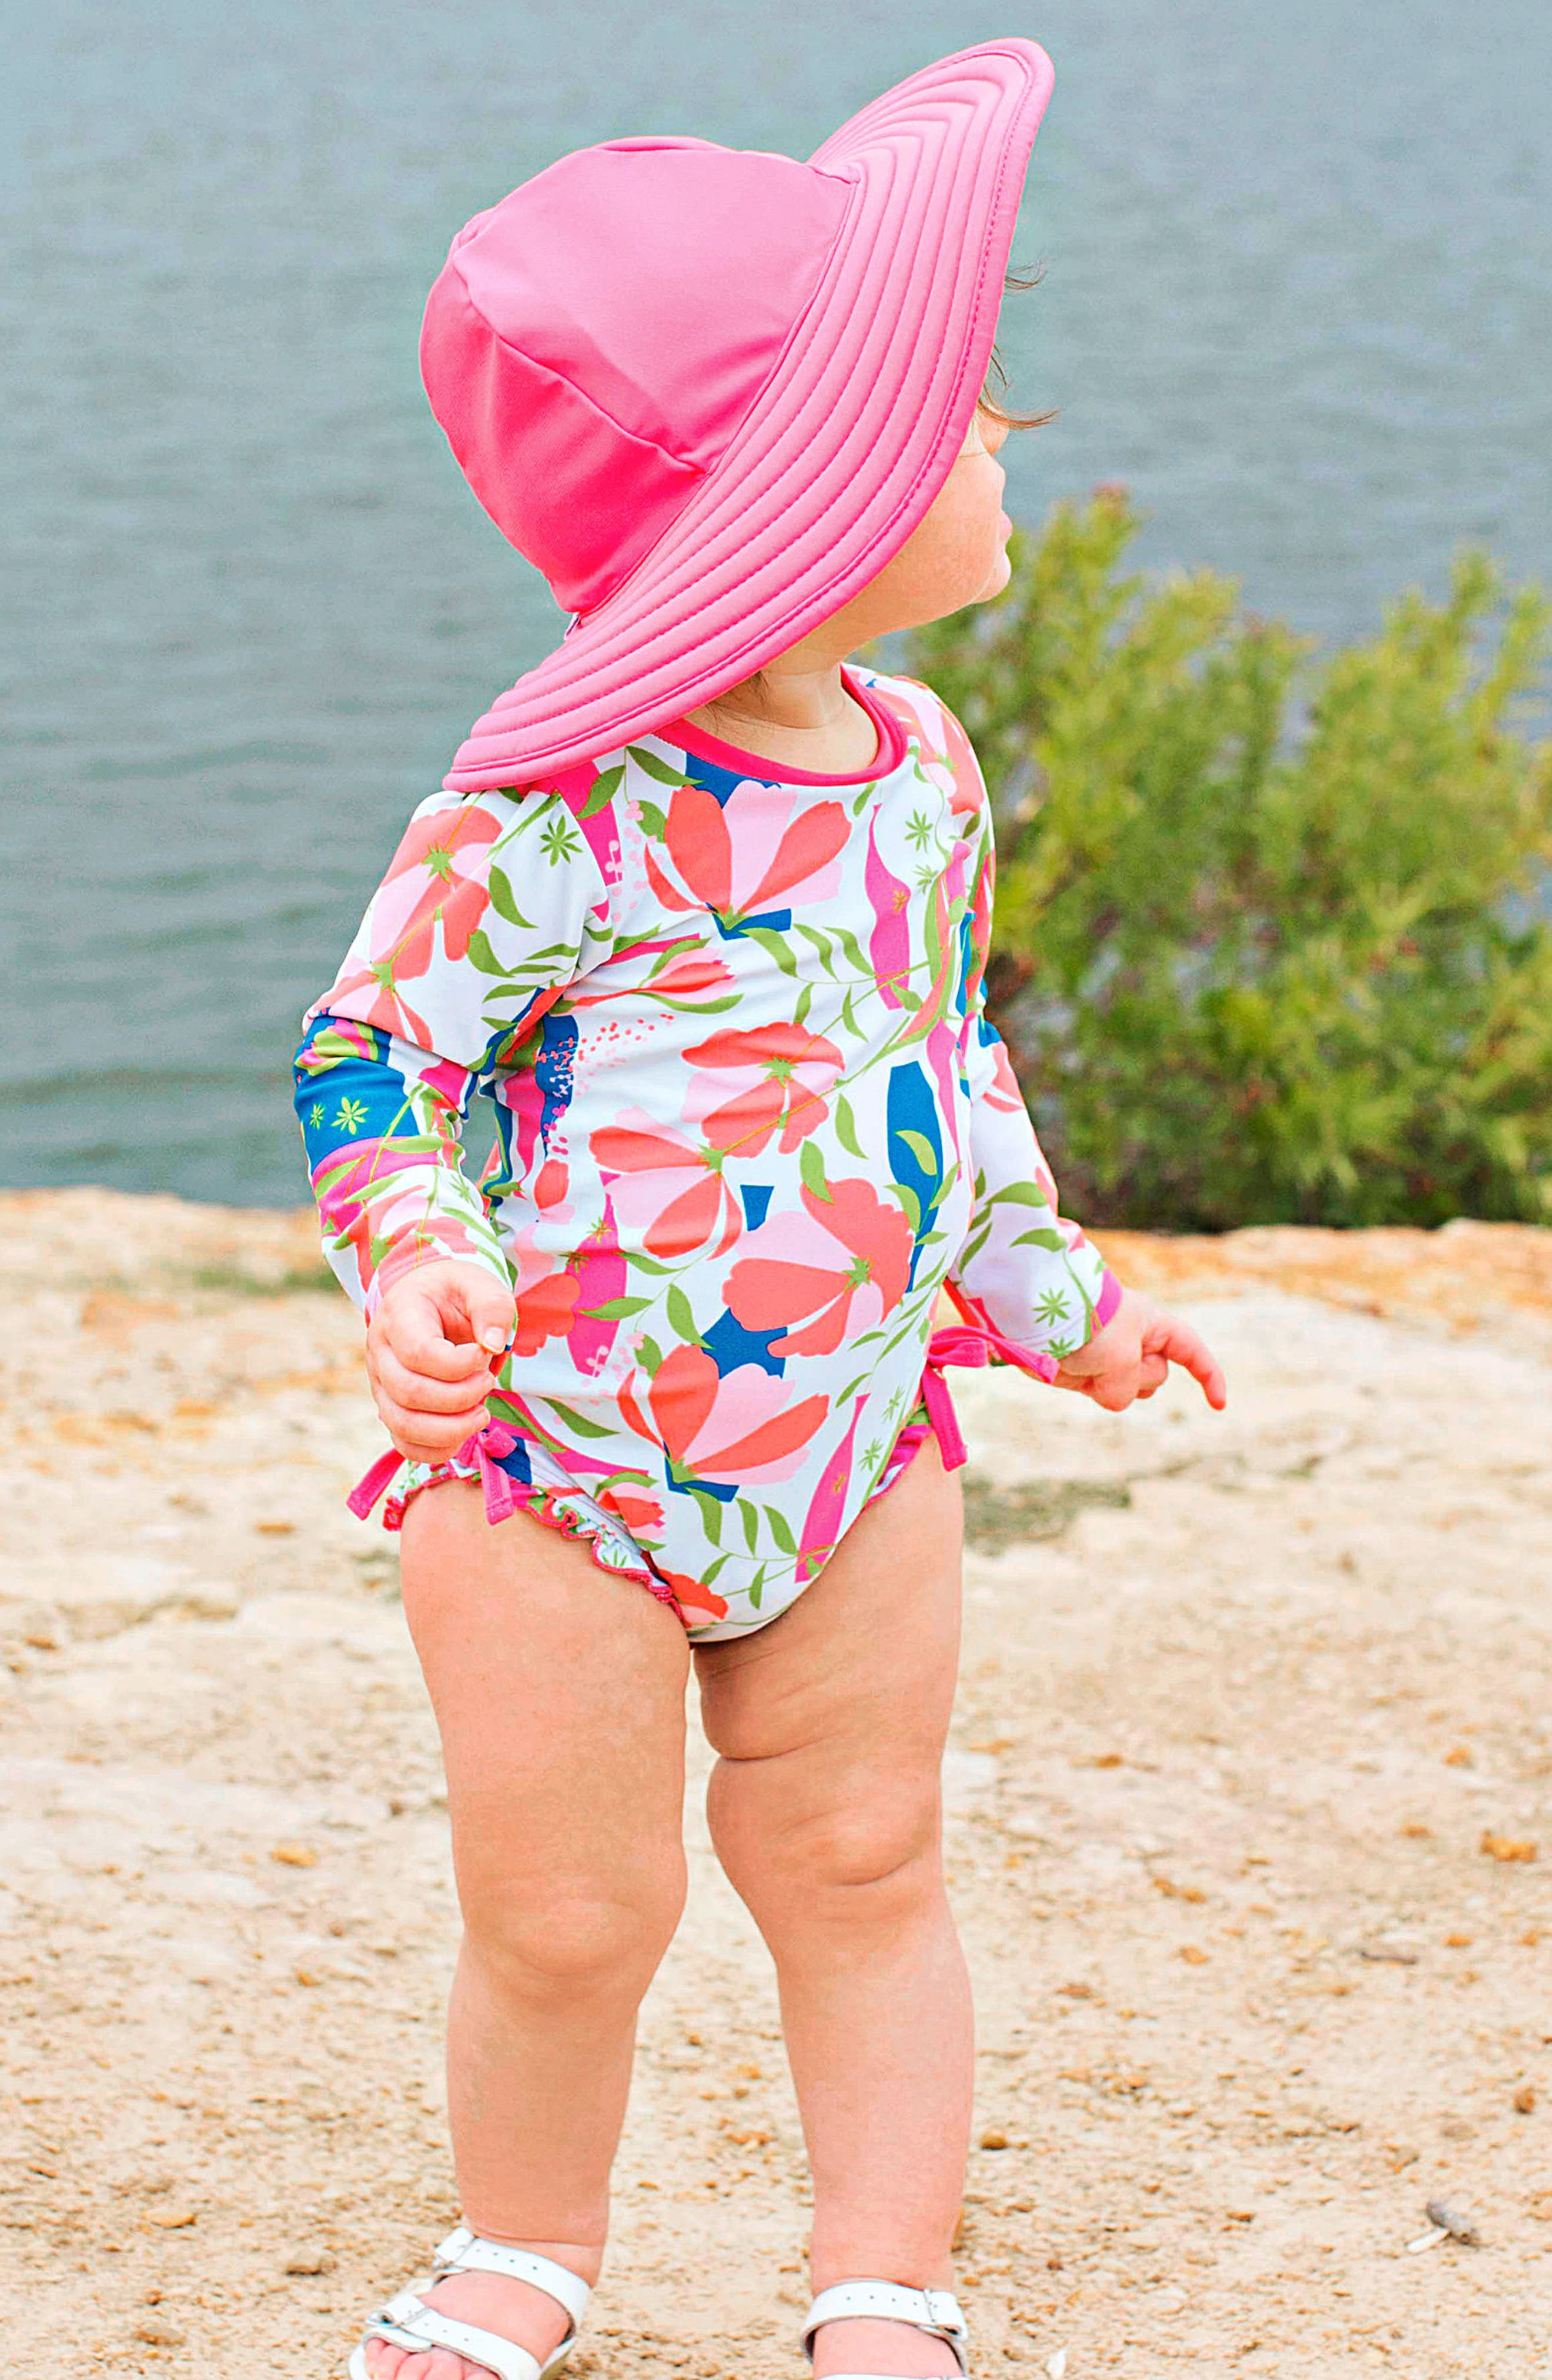 Alternate Image 3  - Ruffle Butts Jeweled Stems One-Piece Rashguard Swimsuit & Sun Hat Set (Baby Girls)